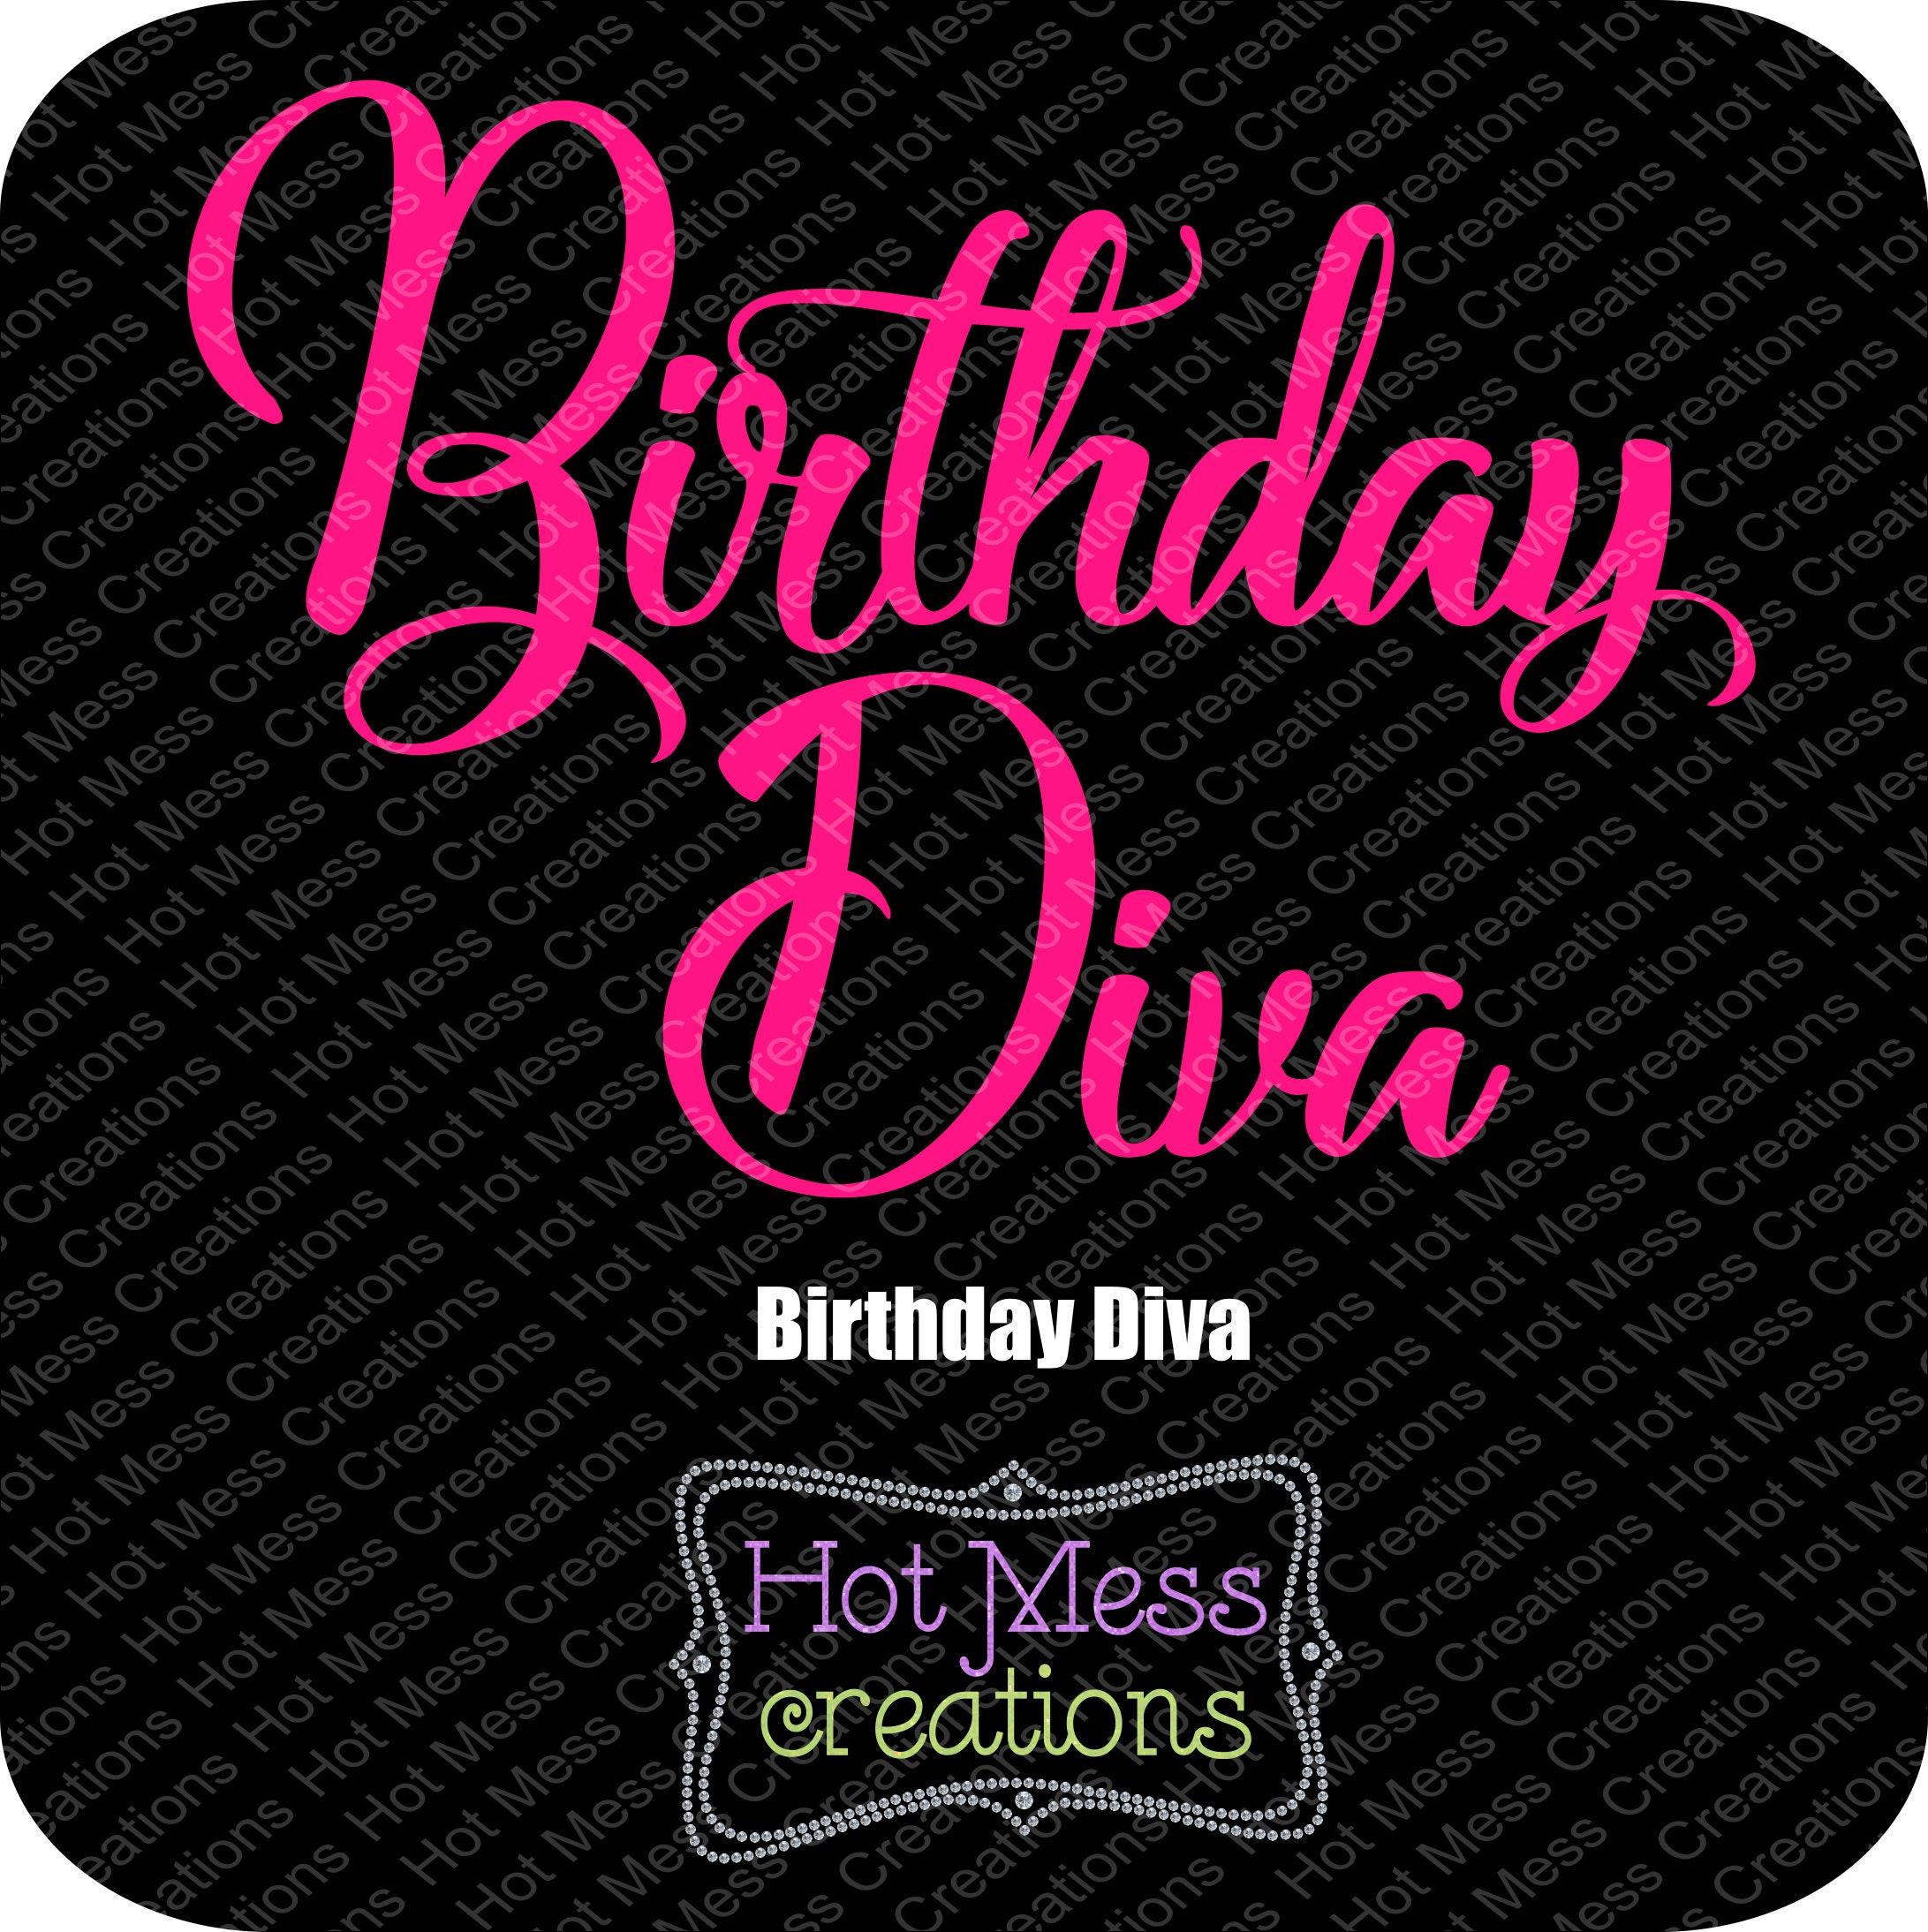 Diva Design: Birthday Diva SVG Birthday Girl Diva Design Birthday